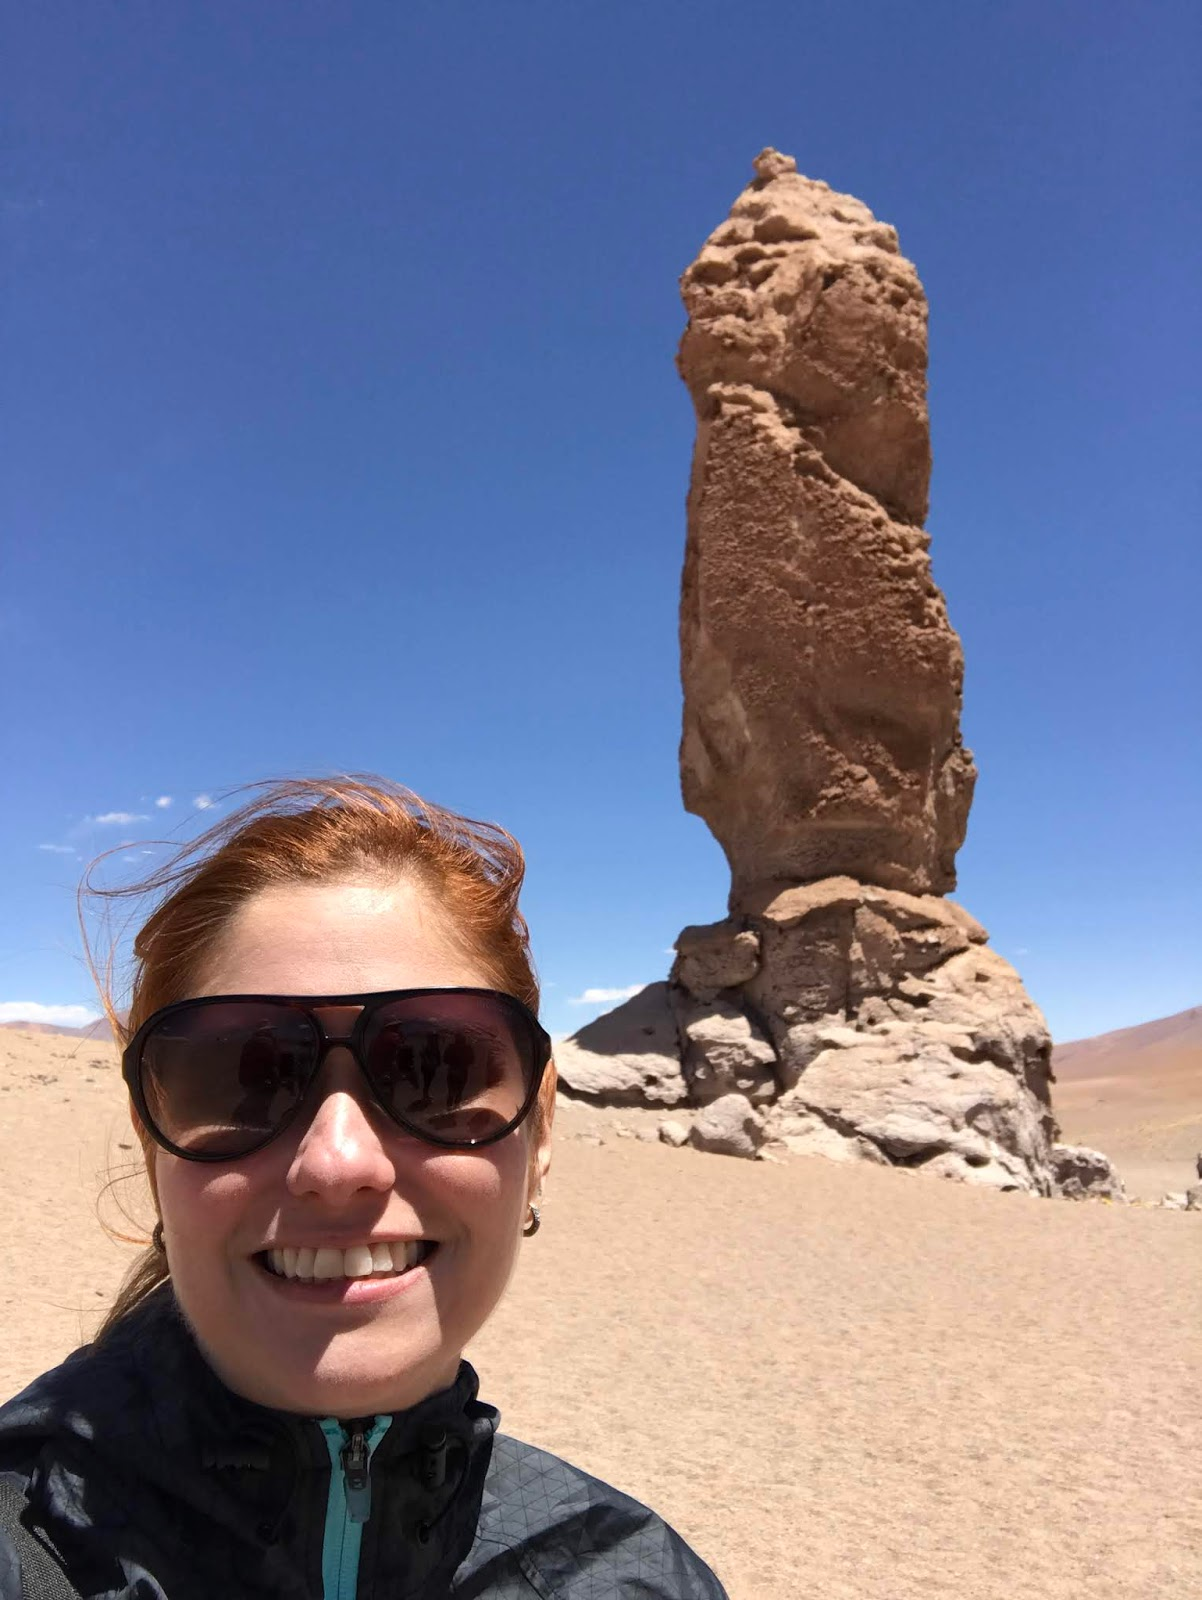 Monjes de la Pacama - Deserto do Atacama